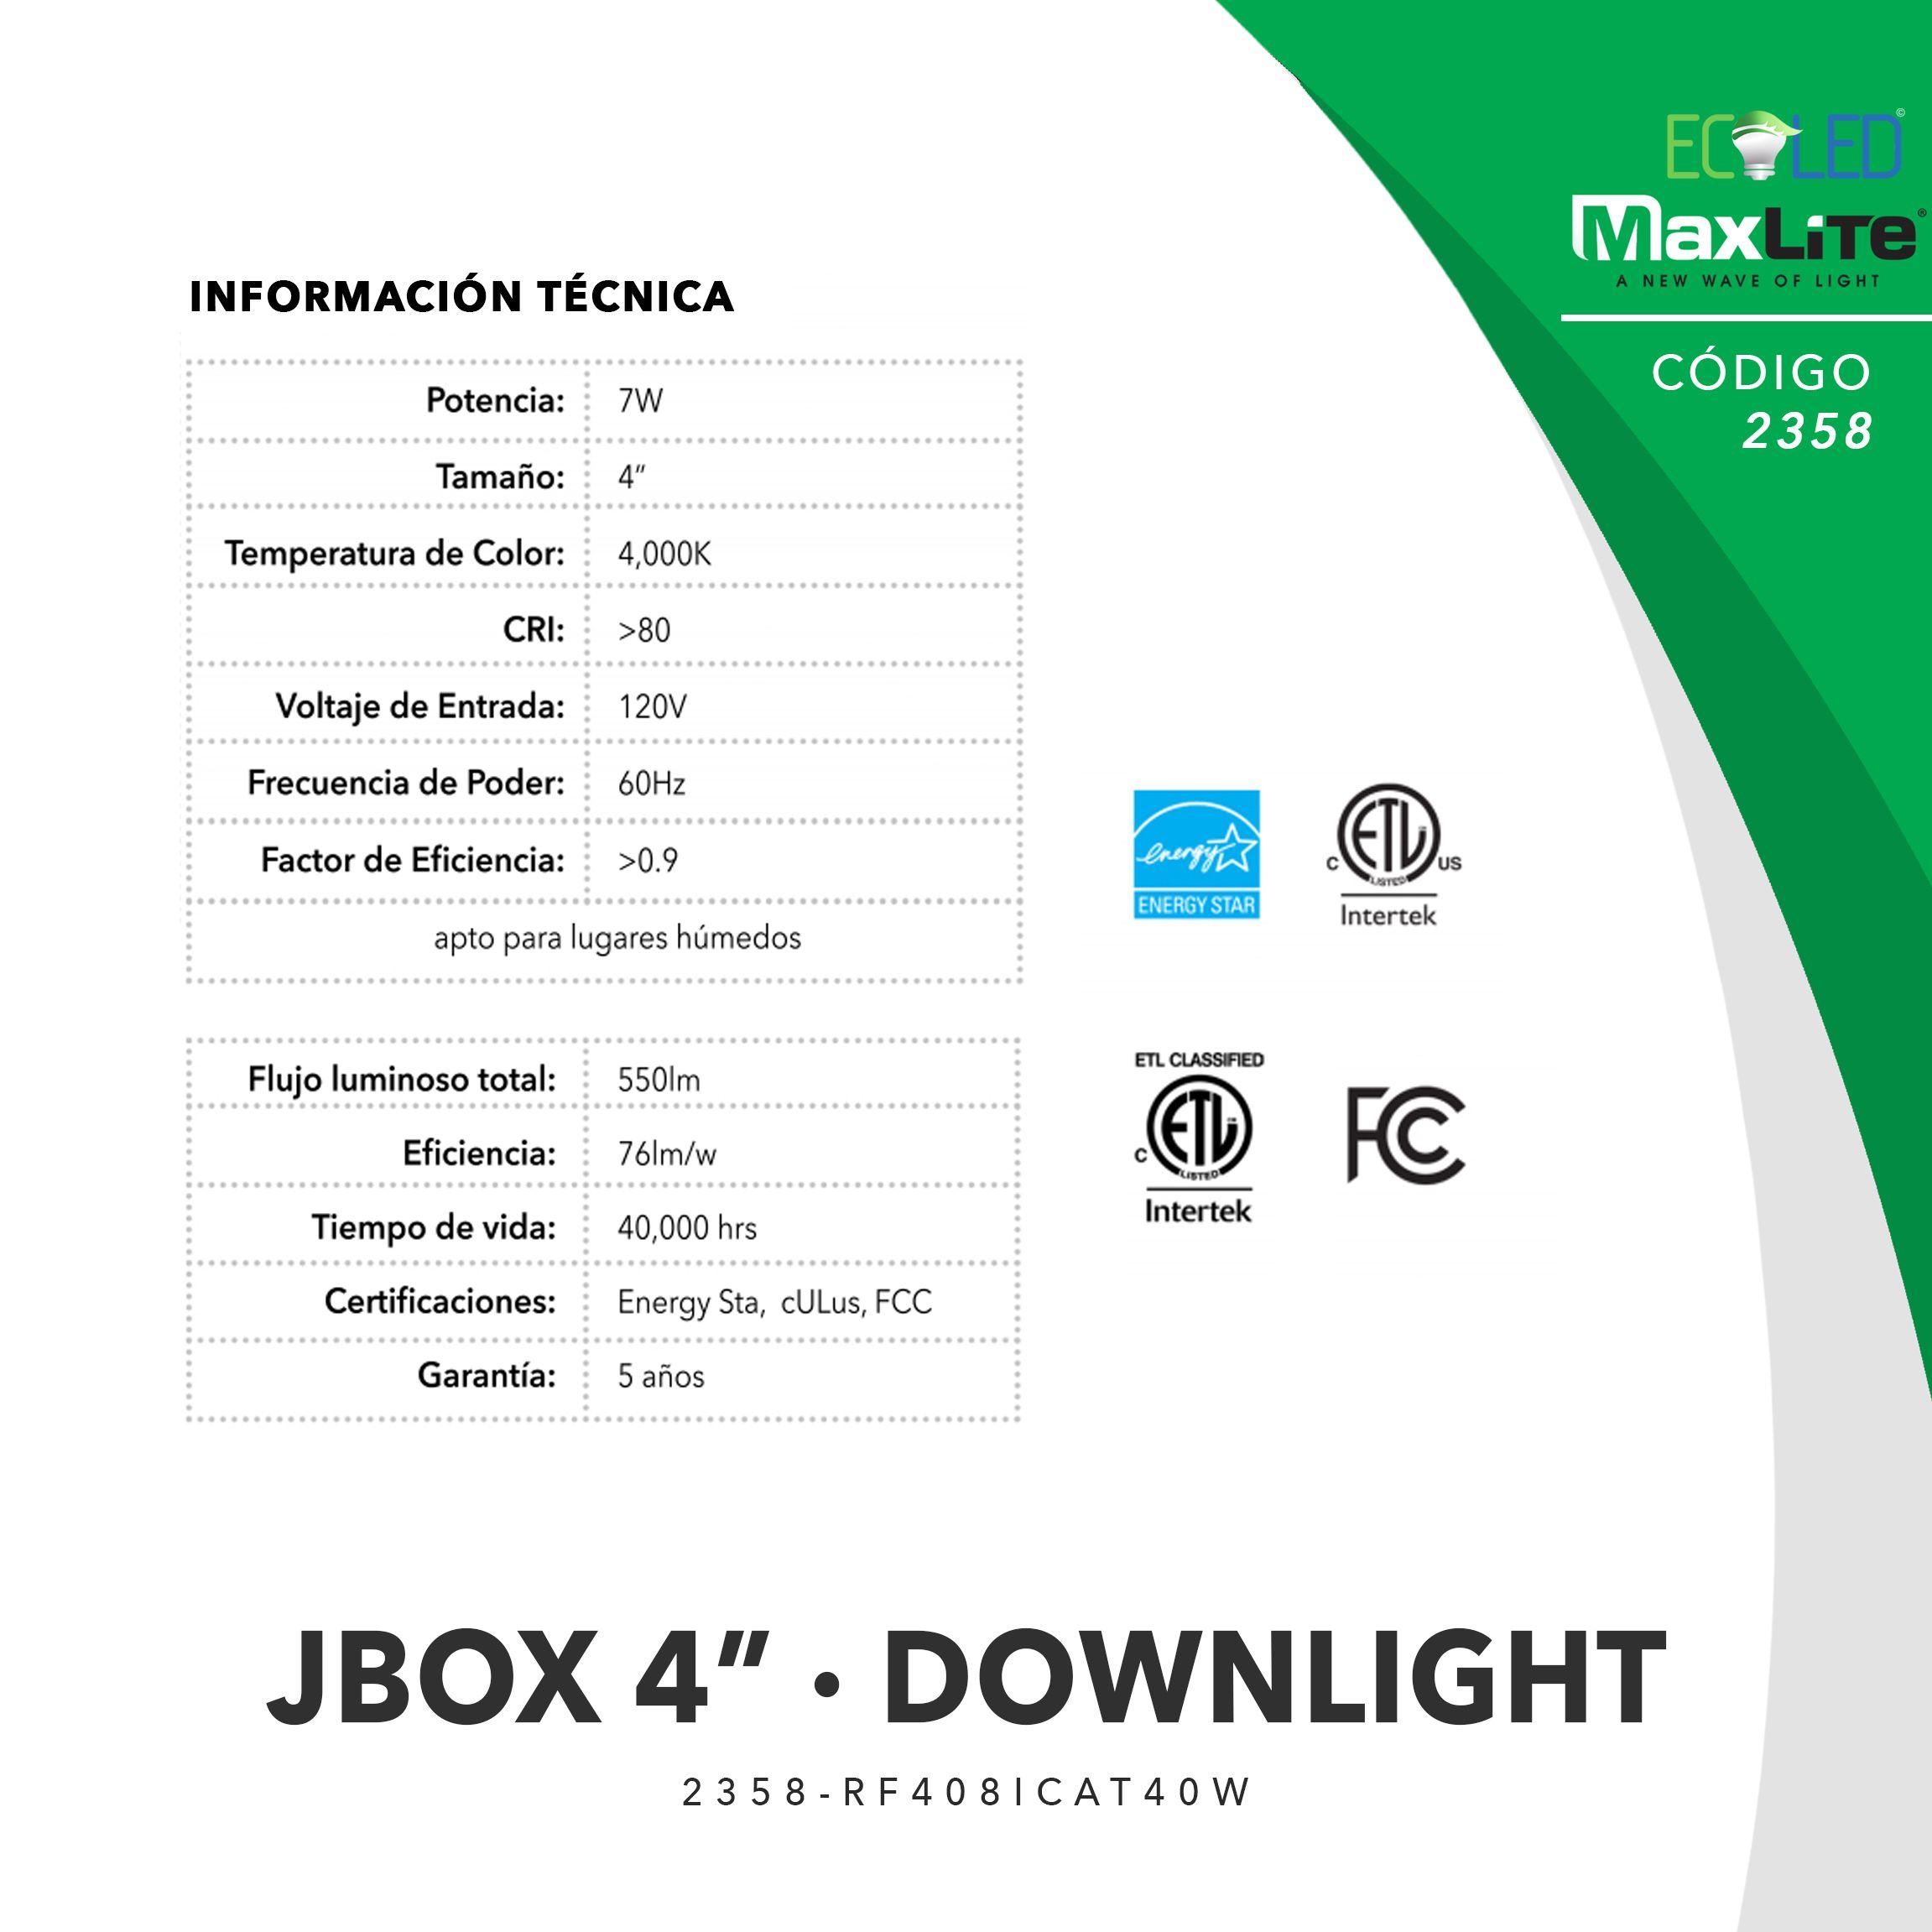 2358 - JBOX DOWNLIGHT 4